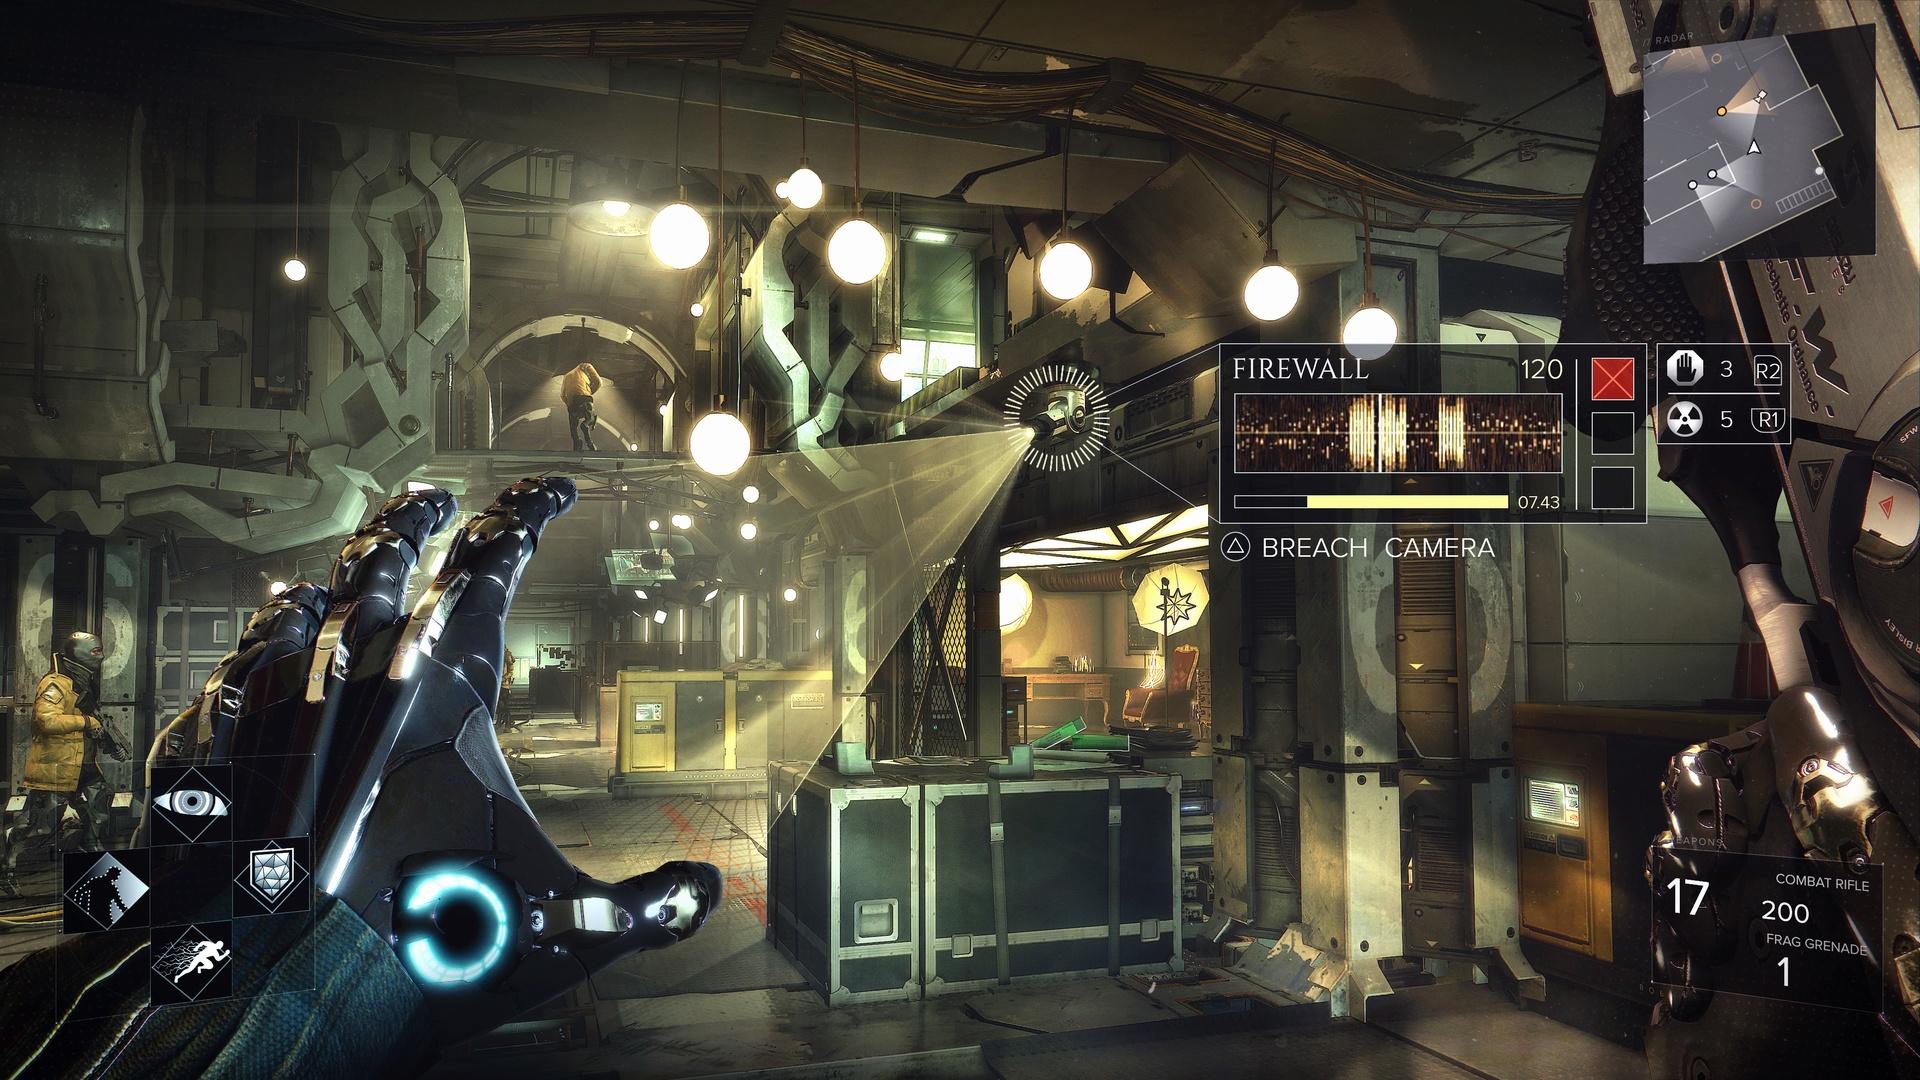 Deus-Ex-Mankind-Divided-Gamescom-2015-Screenshots-1